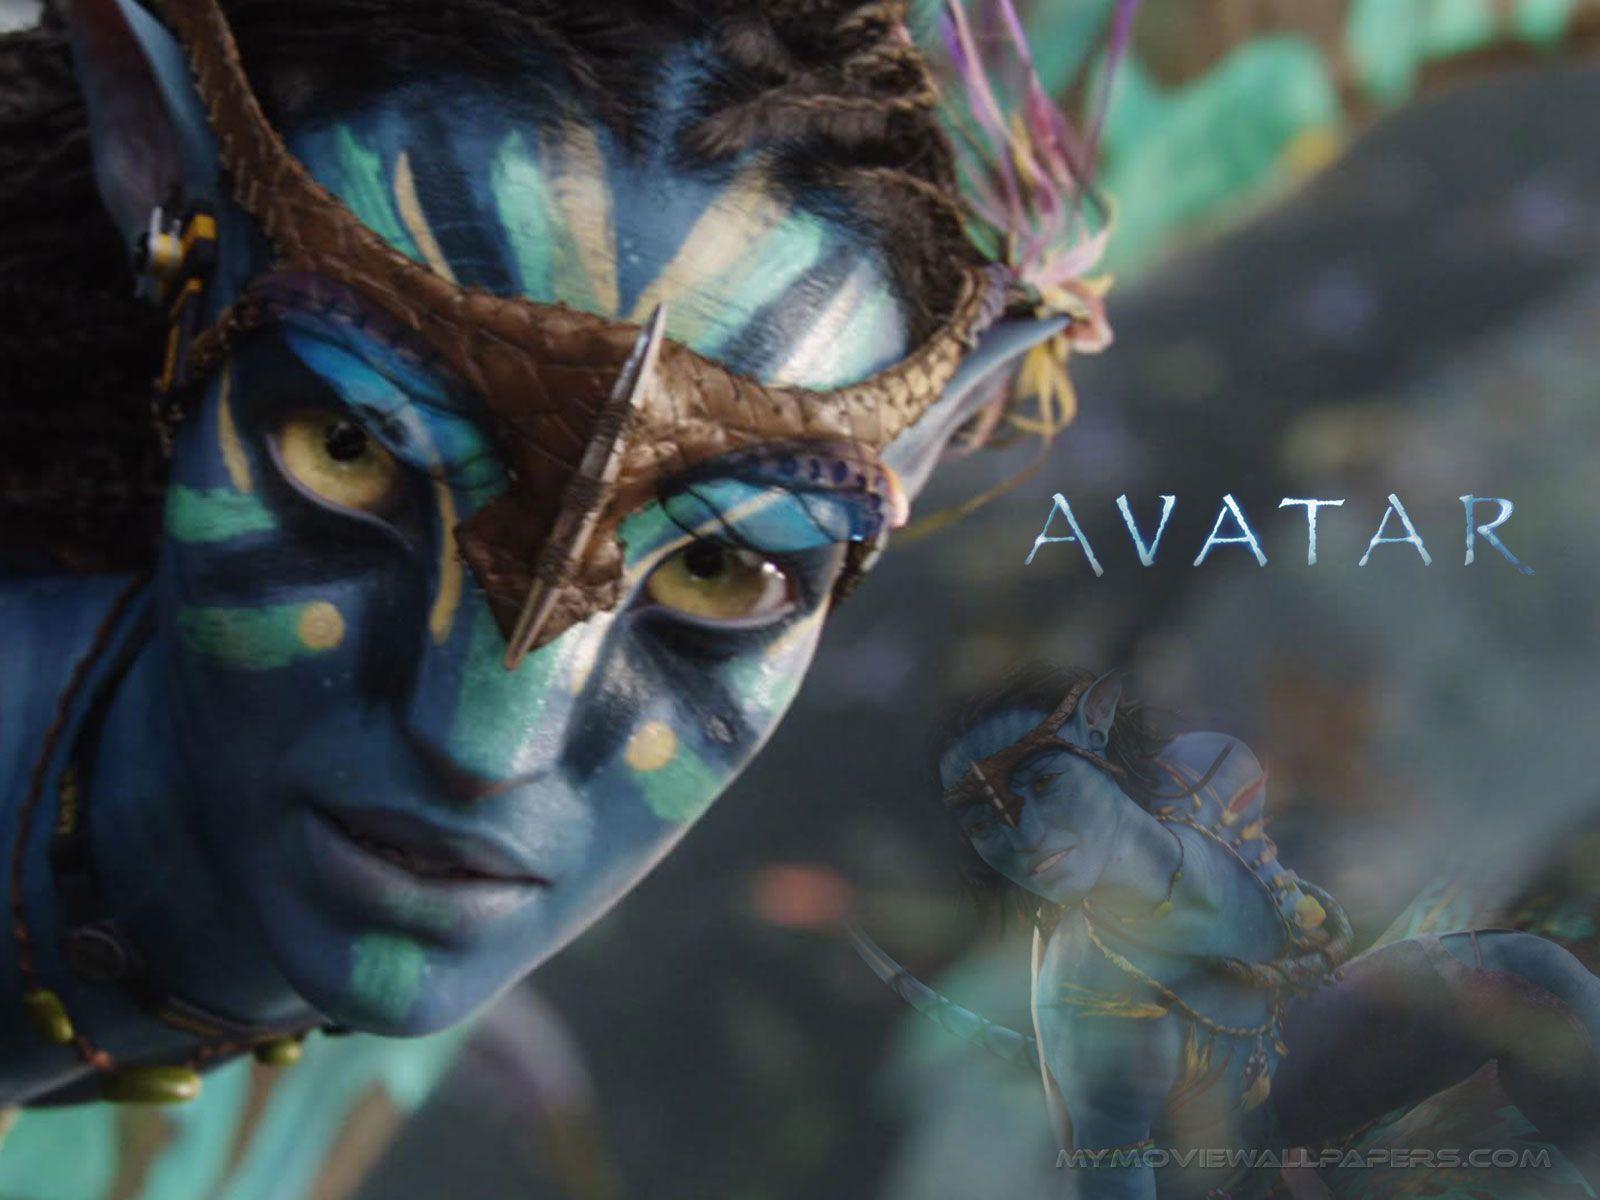 avatar in 3d hd movie full movie / planes film cast